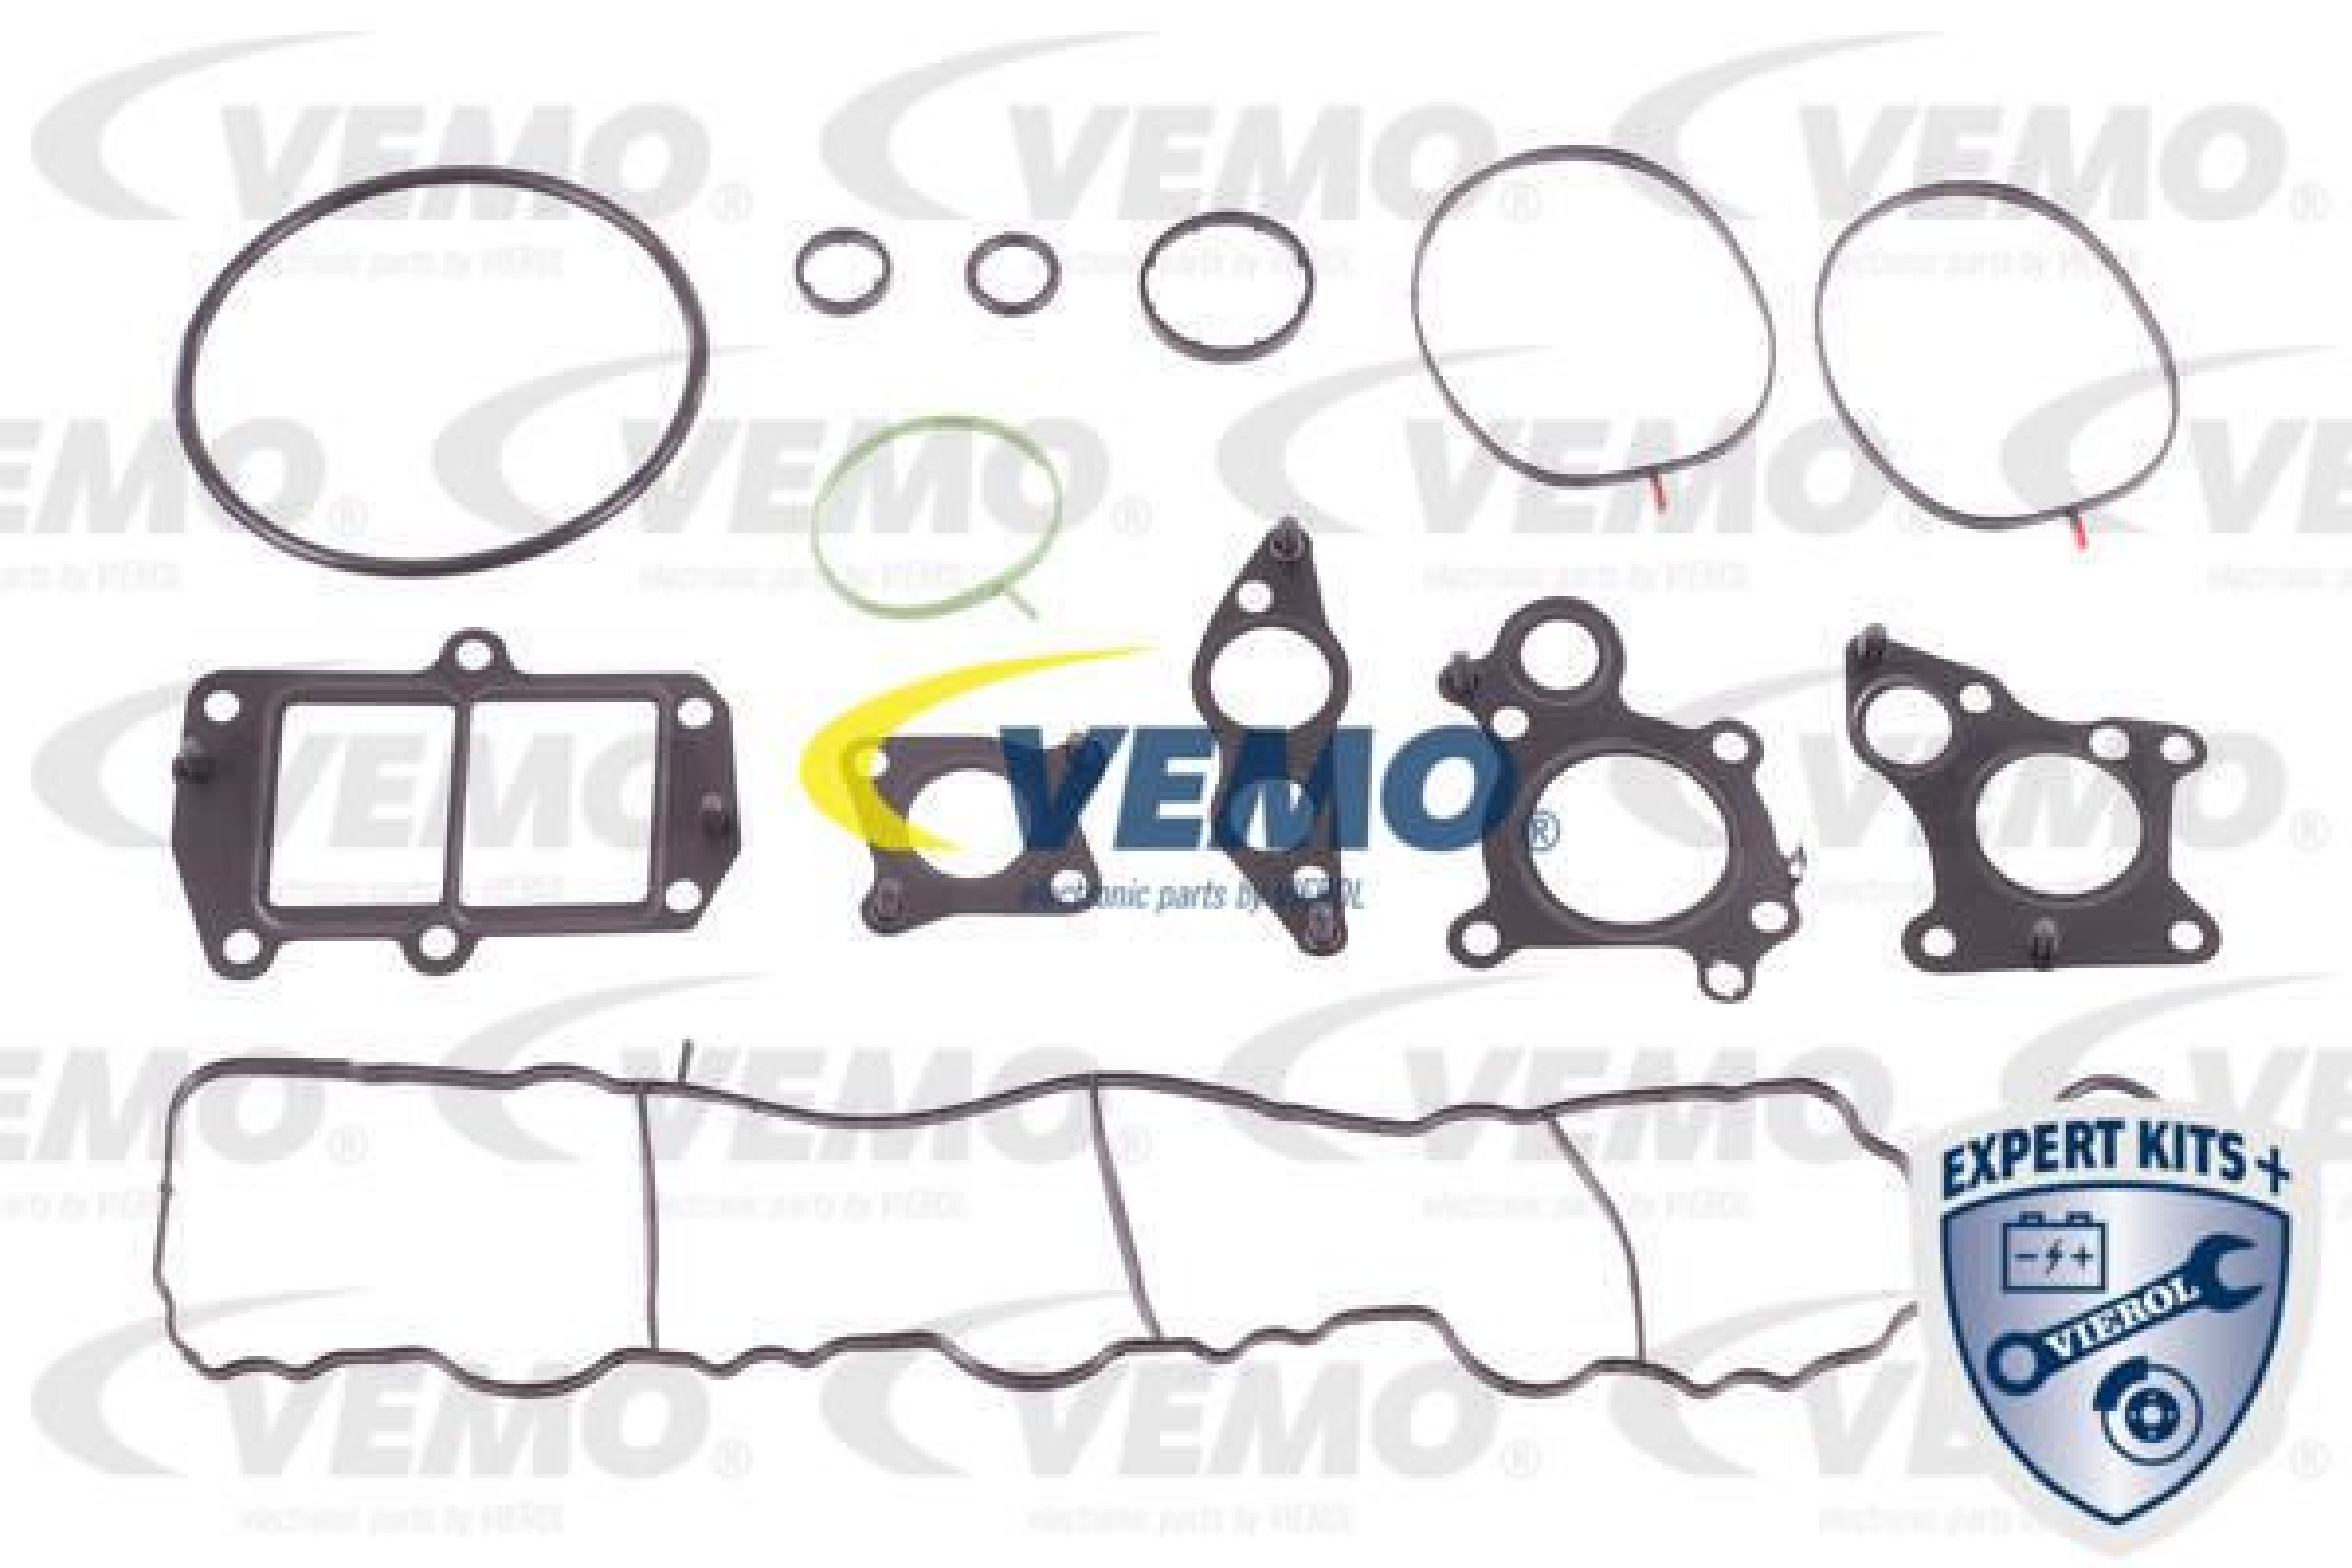 Mercedes C-Class 2015 Oil cooler seal VEMO V30-60-91315: